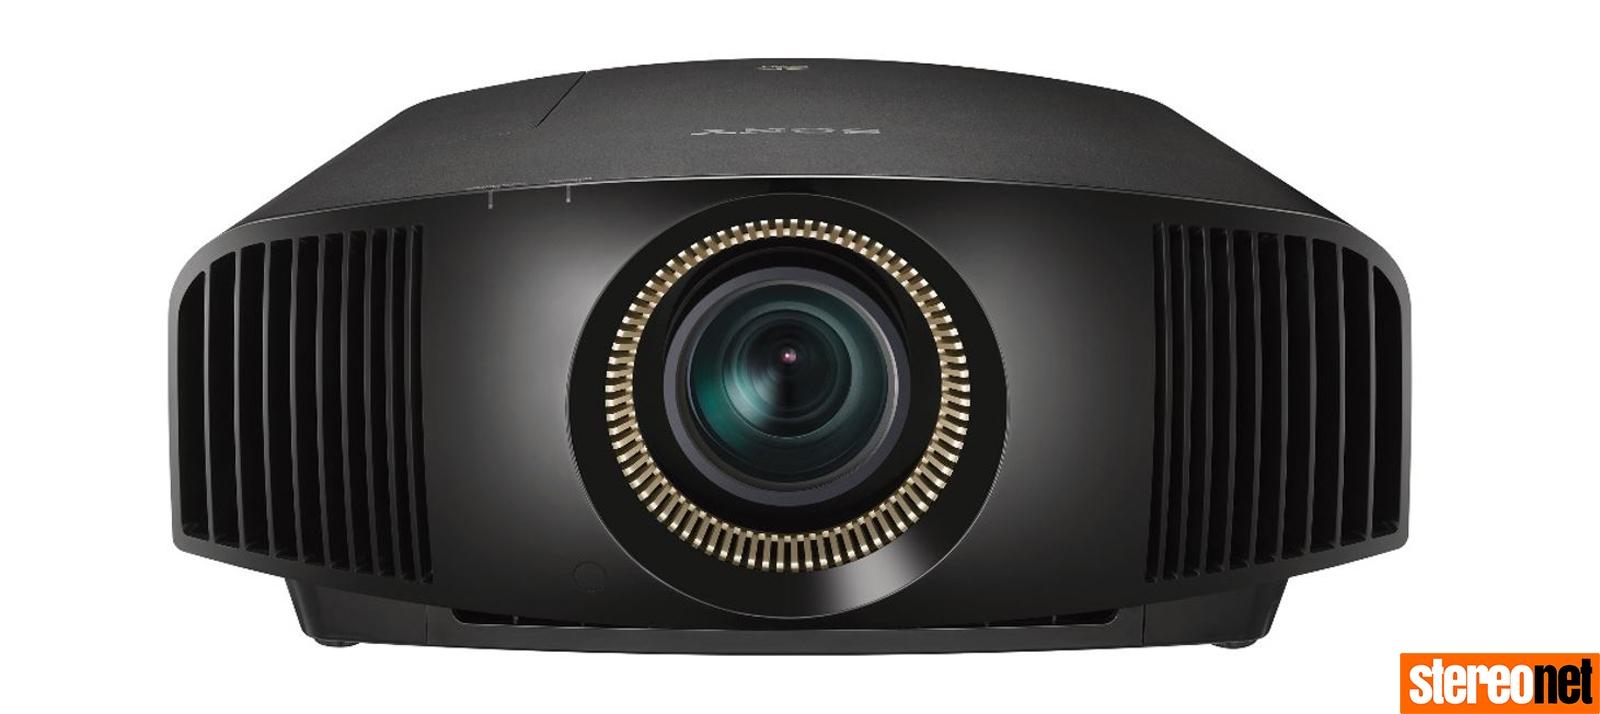 Sony VPL-VW590ES 4K Projector Review